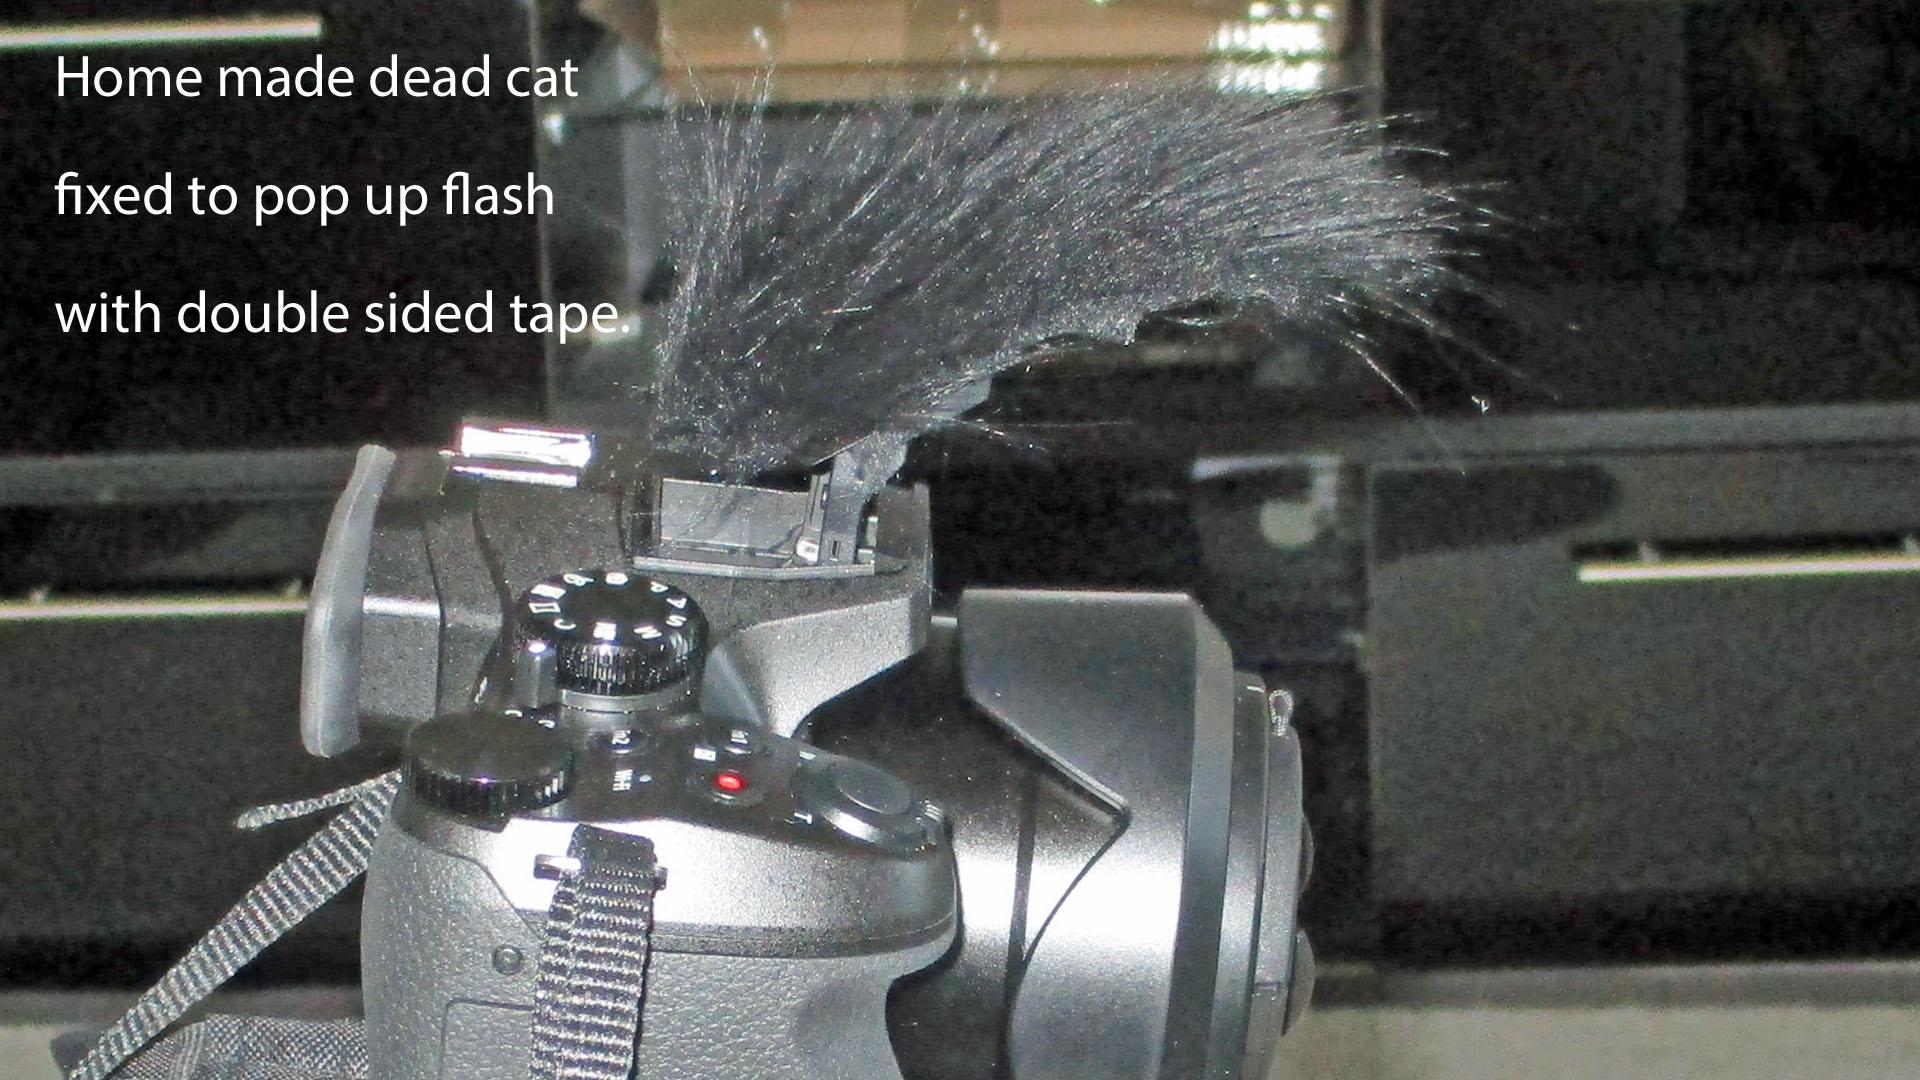 Panasonic PV-GS39 Camcorder External Microphone